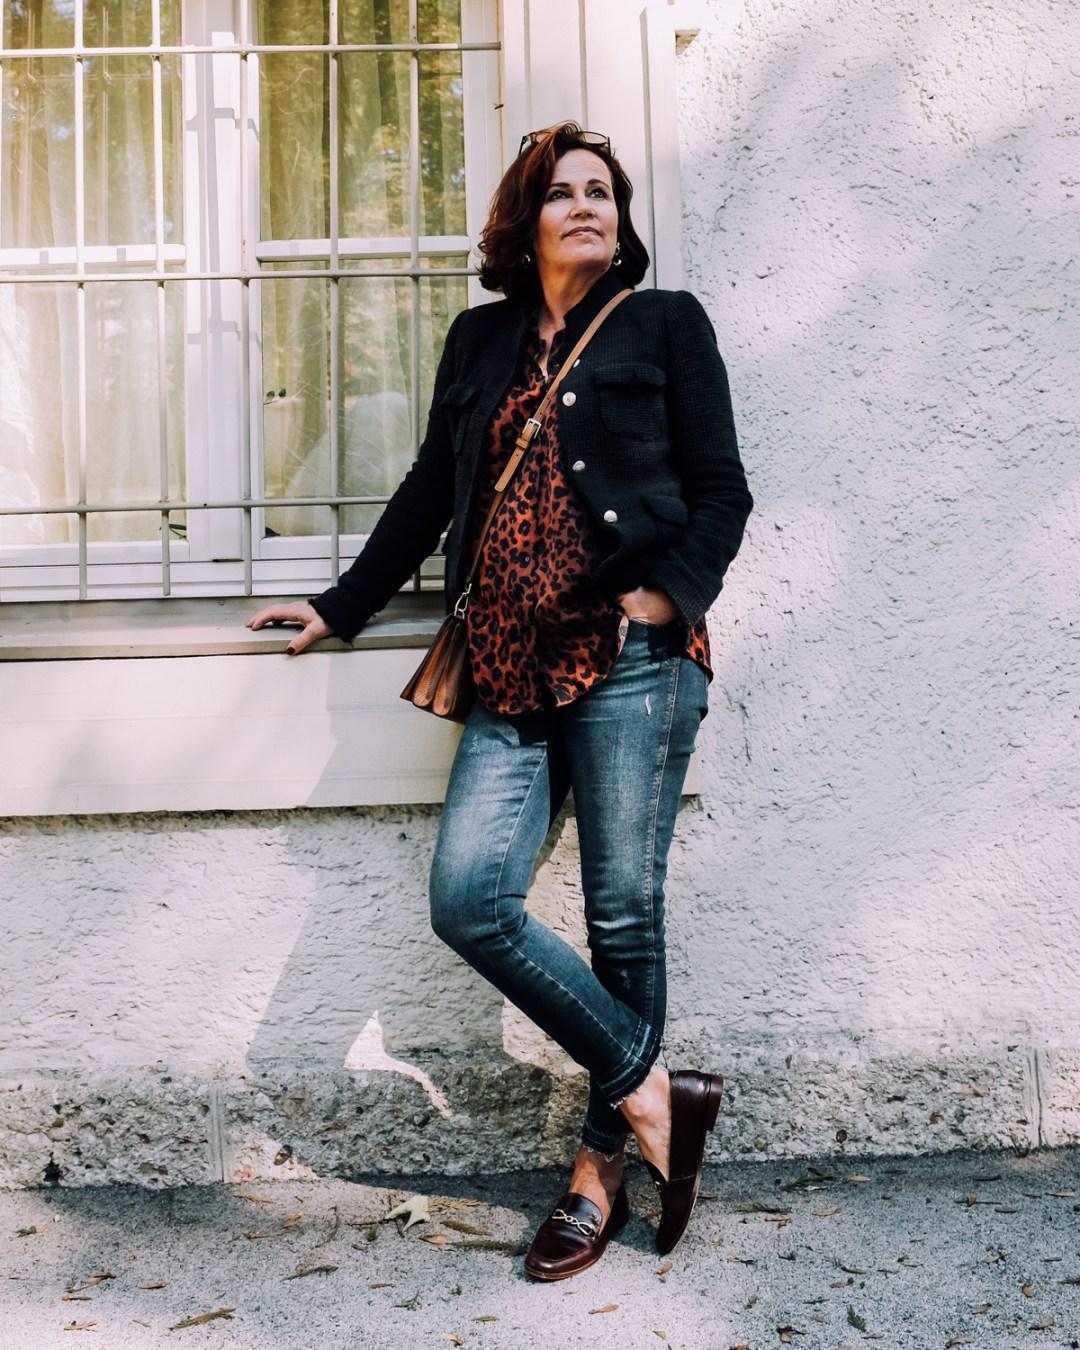 inastil, Ü50Blog, Leomuster, Animalprint, Modeblog, Ü50Mode, Modeberatung, Stilberatung, Casual, Ageless, Kürbisrezept, gerösteter Kürbis, Aubergine, Herbstmode, Herbstrezept-5